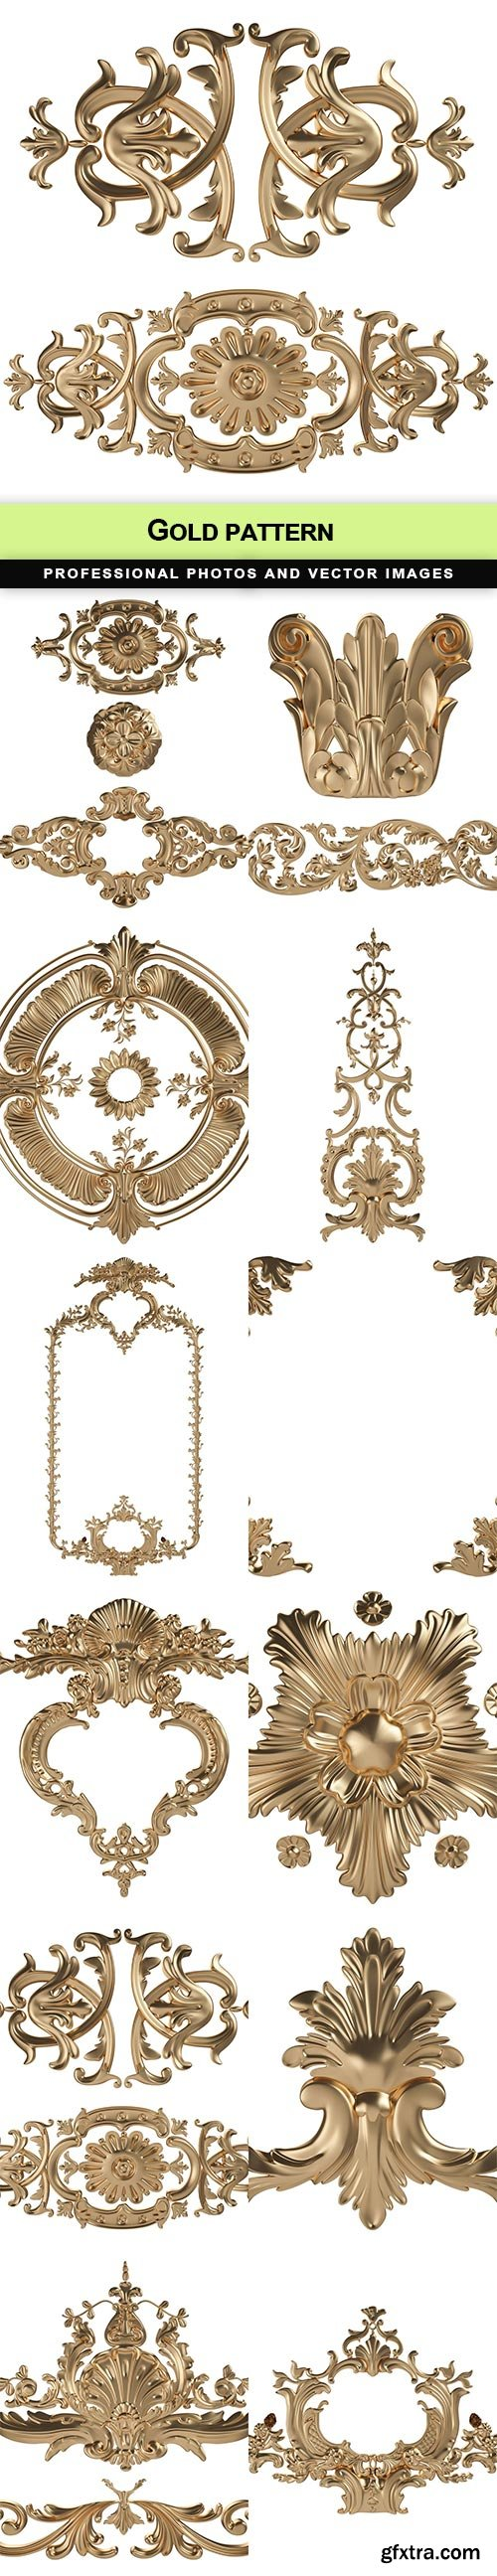 Gold pattern -